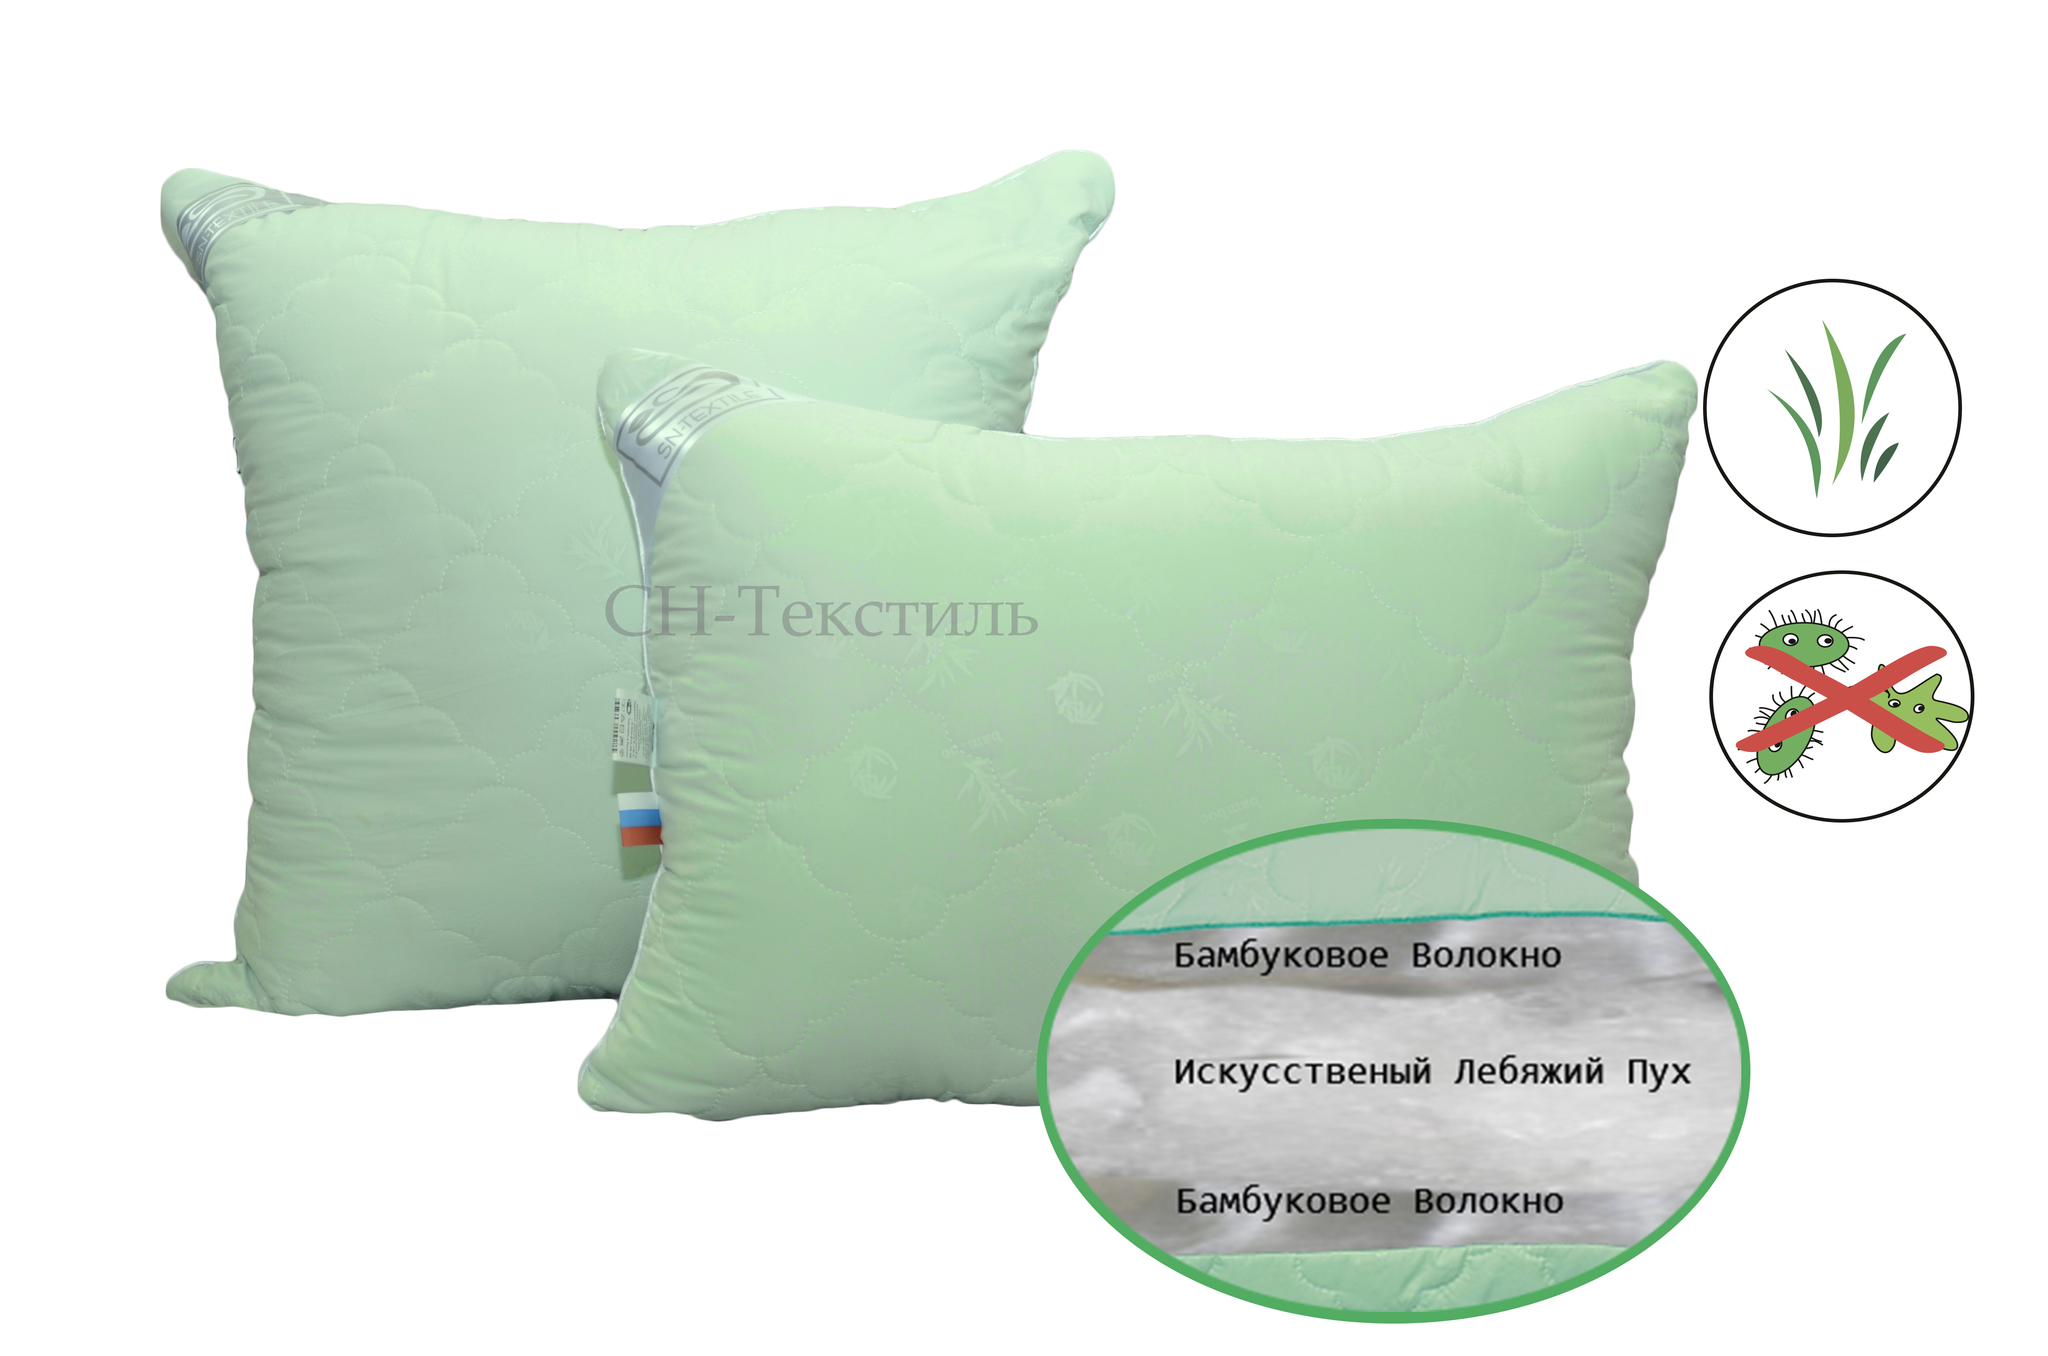 Одеяла и Подушки Подушка Коллекция Бамбук-микрофибра бамбук_микрофибра_подушки.jpg